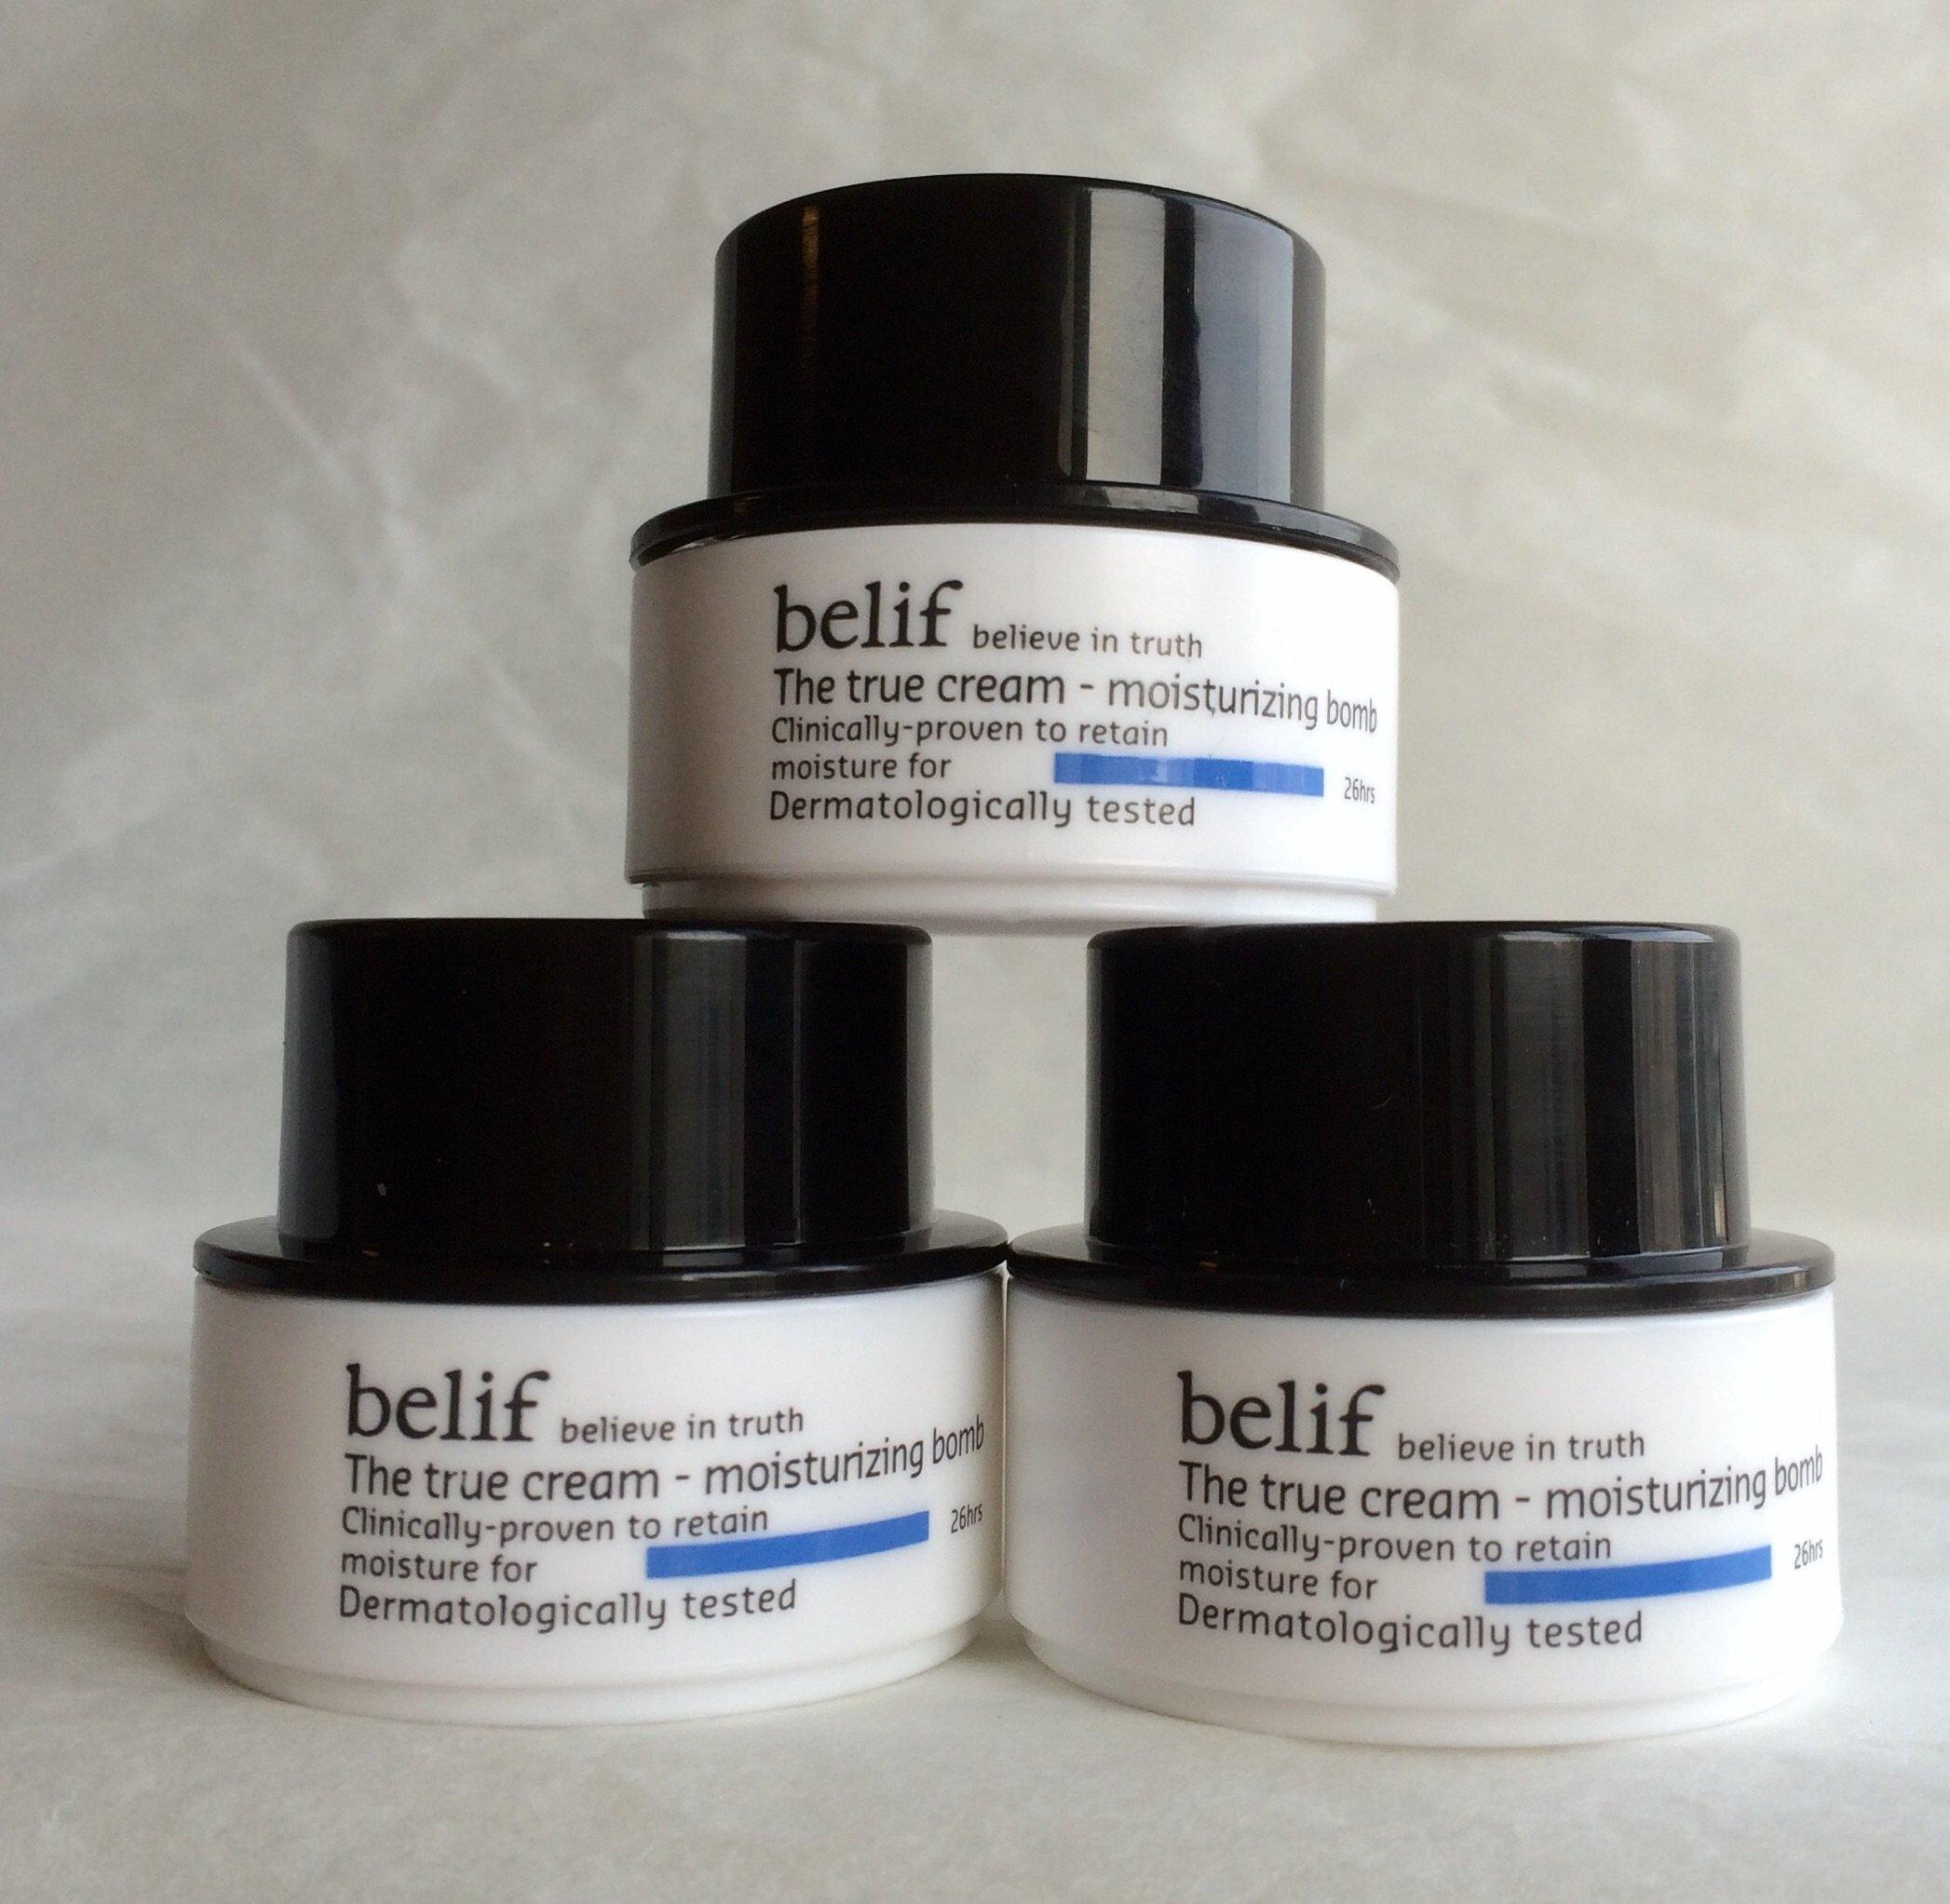 Belif The True Cream Moisturizing Bomb 30ml (10ml X 3, Trial Size) by belif